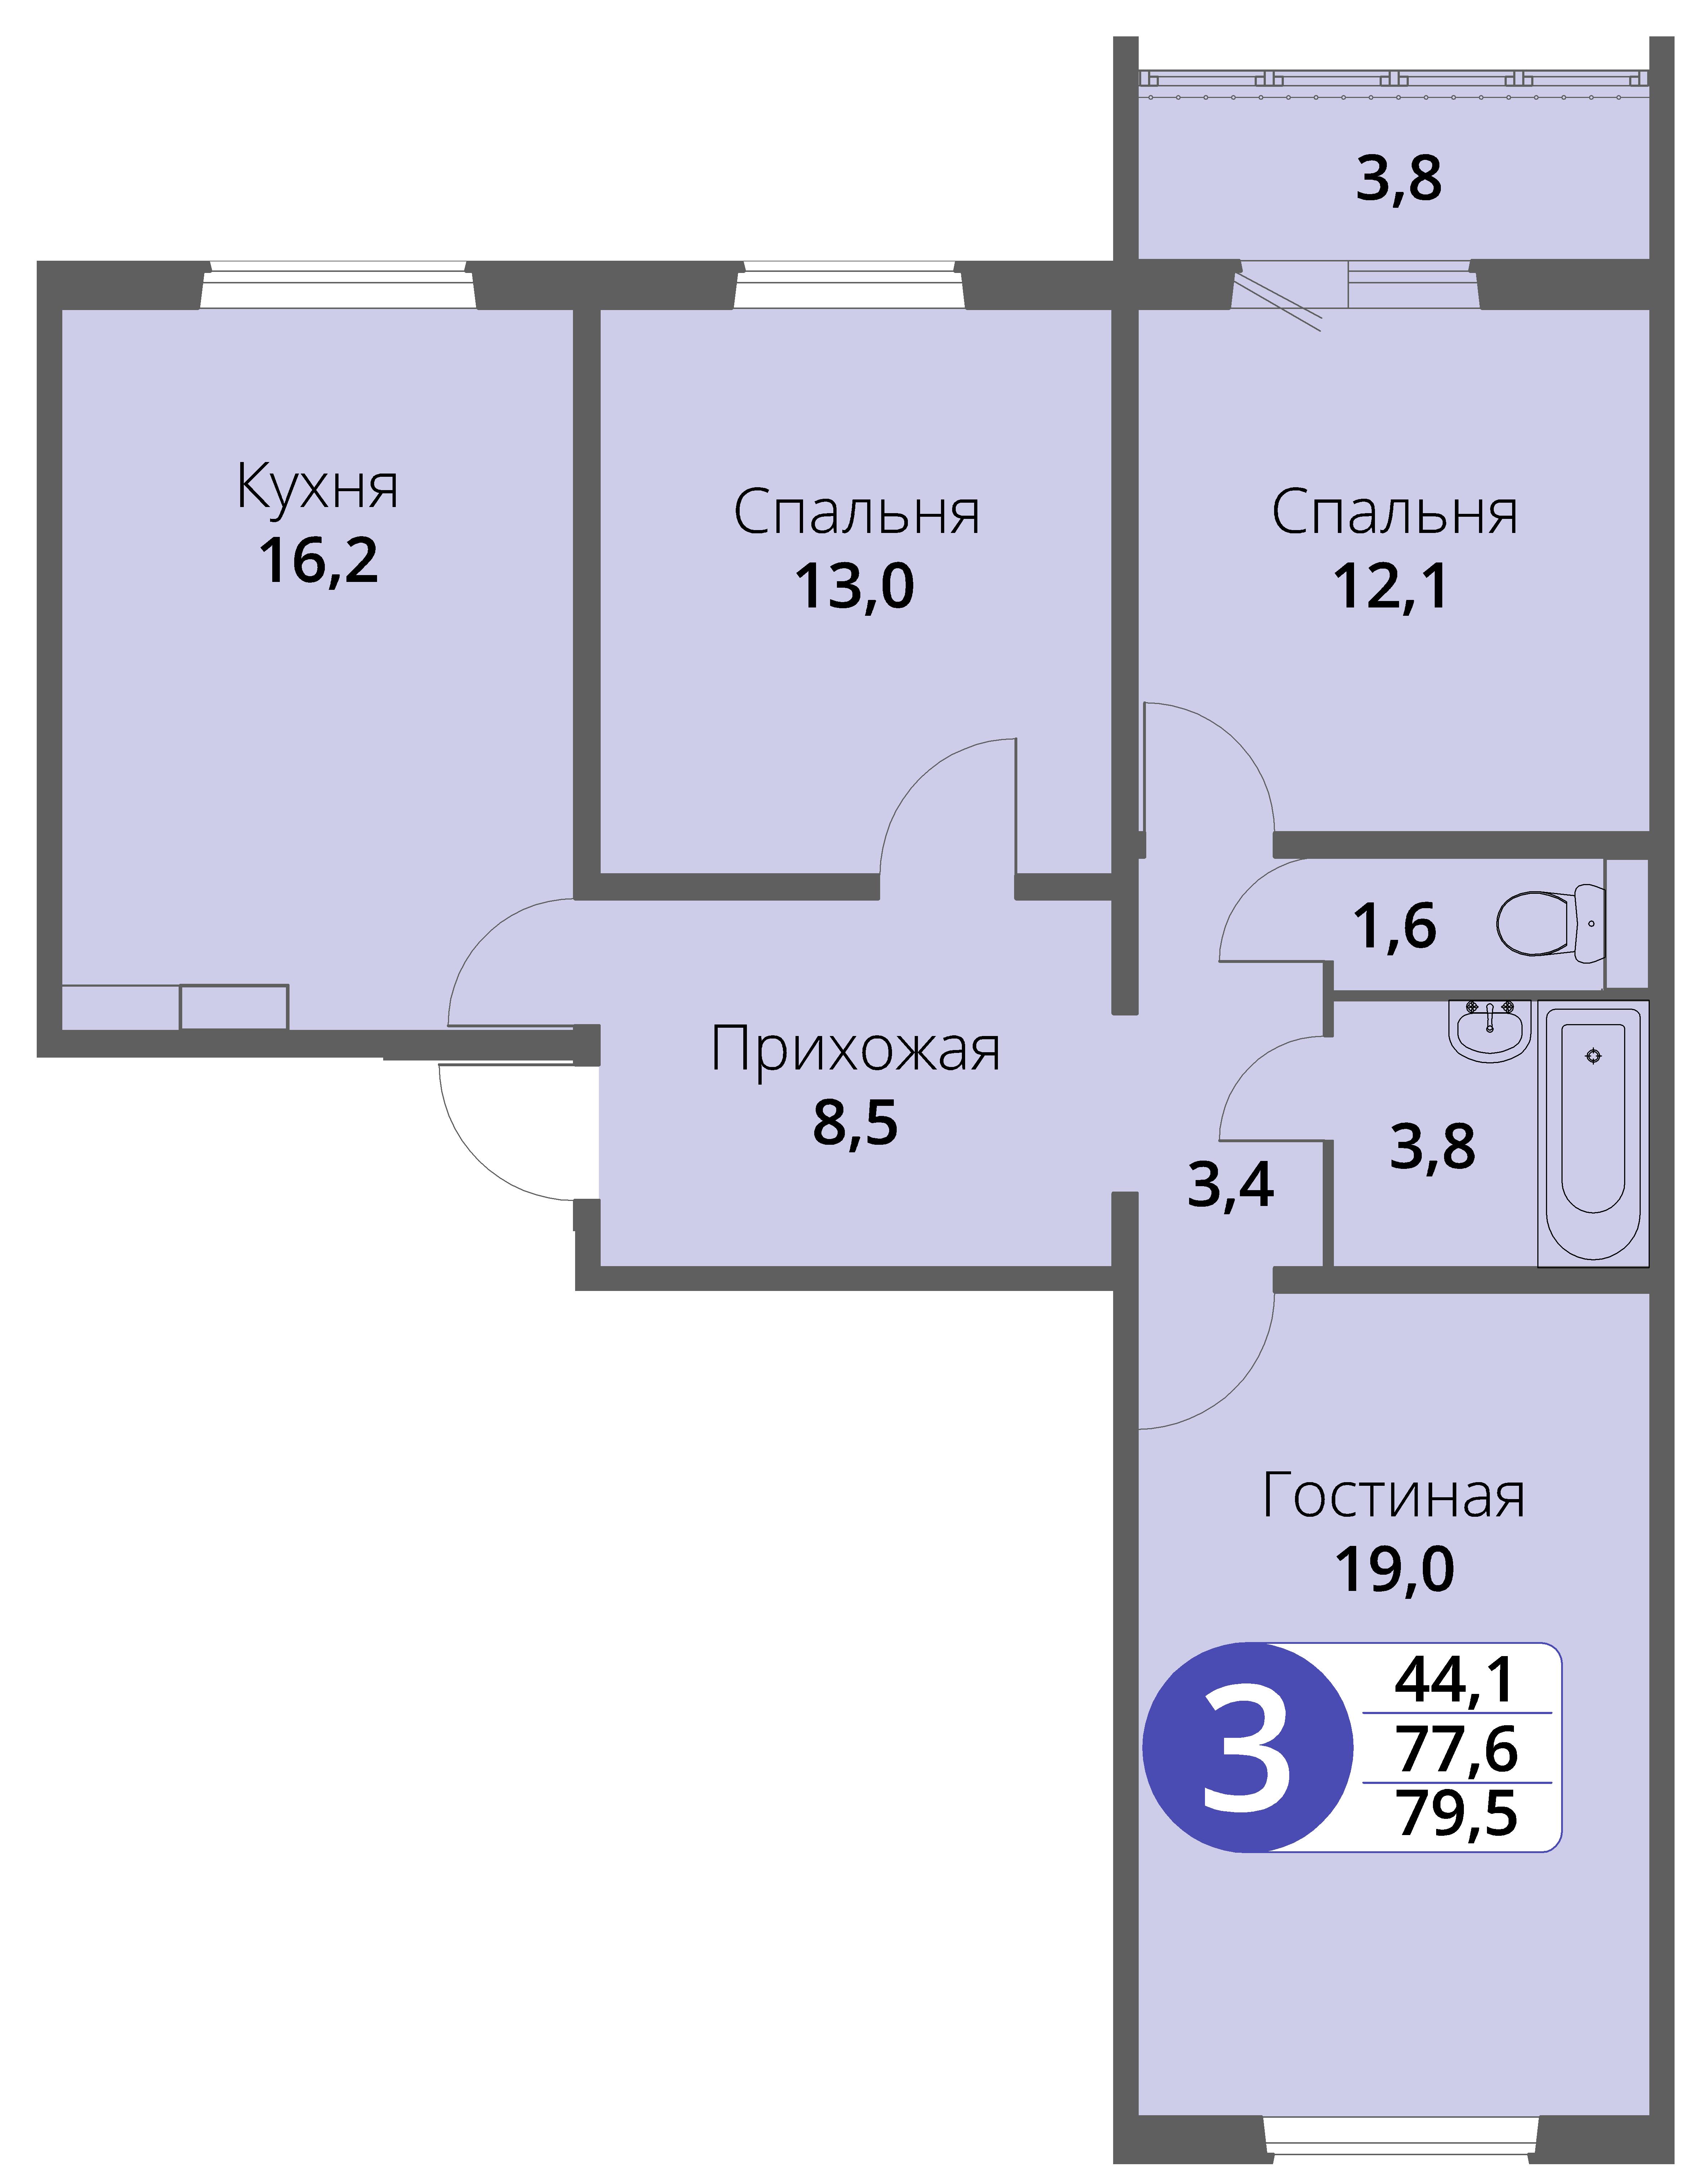 Зареченская 1-1, квартира 121 - Трехкомнатная